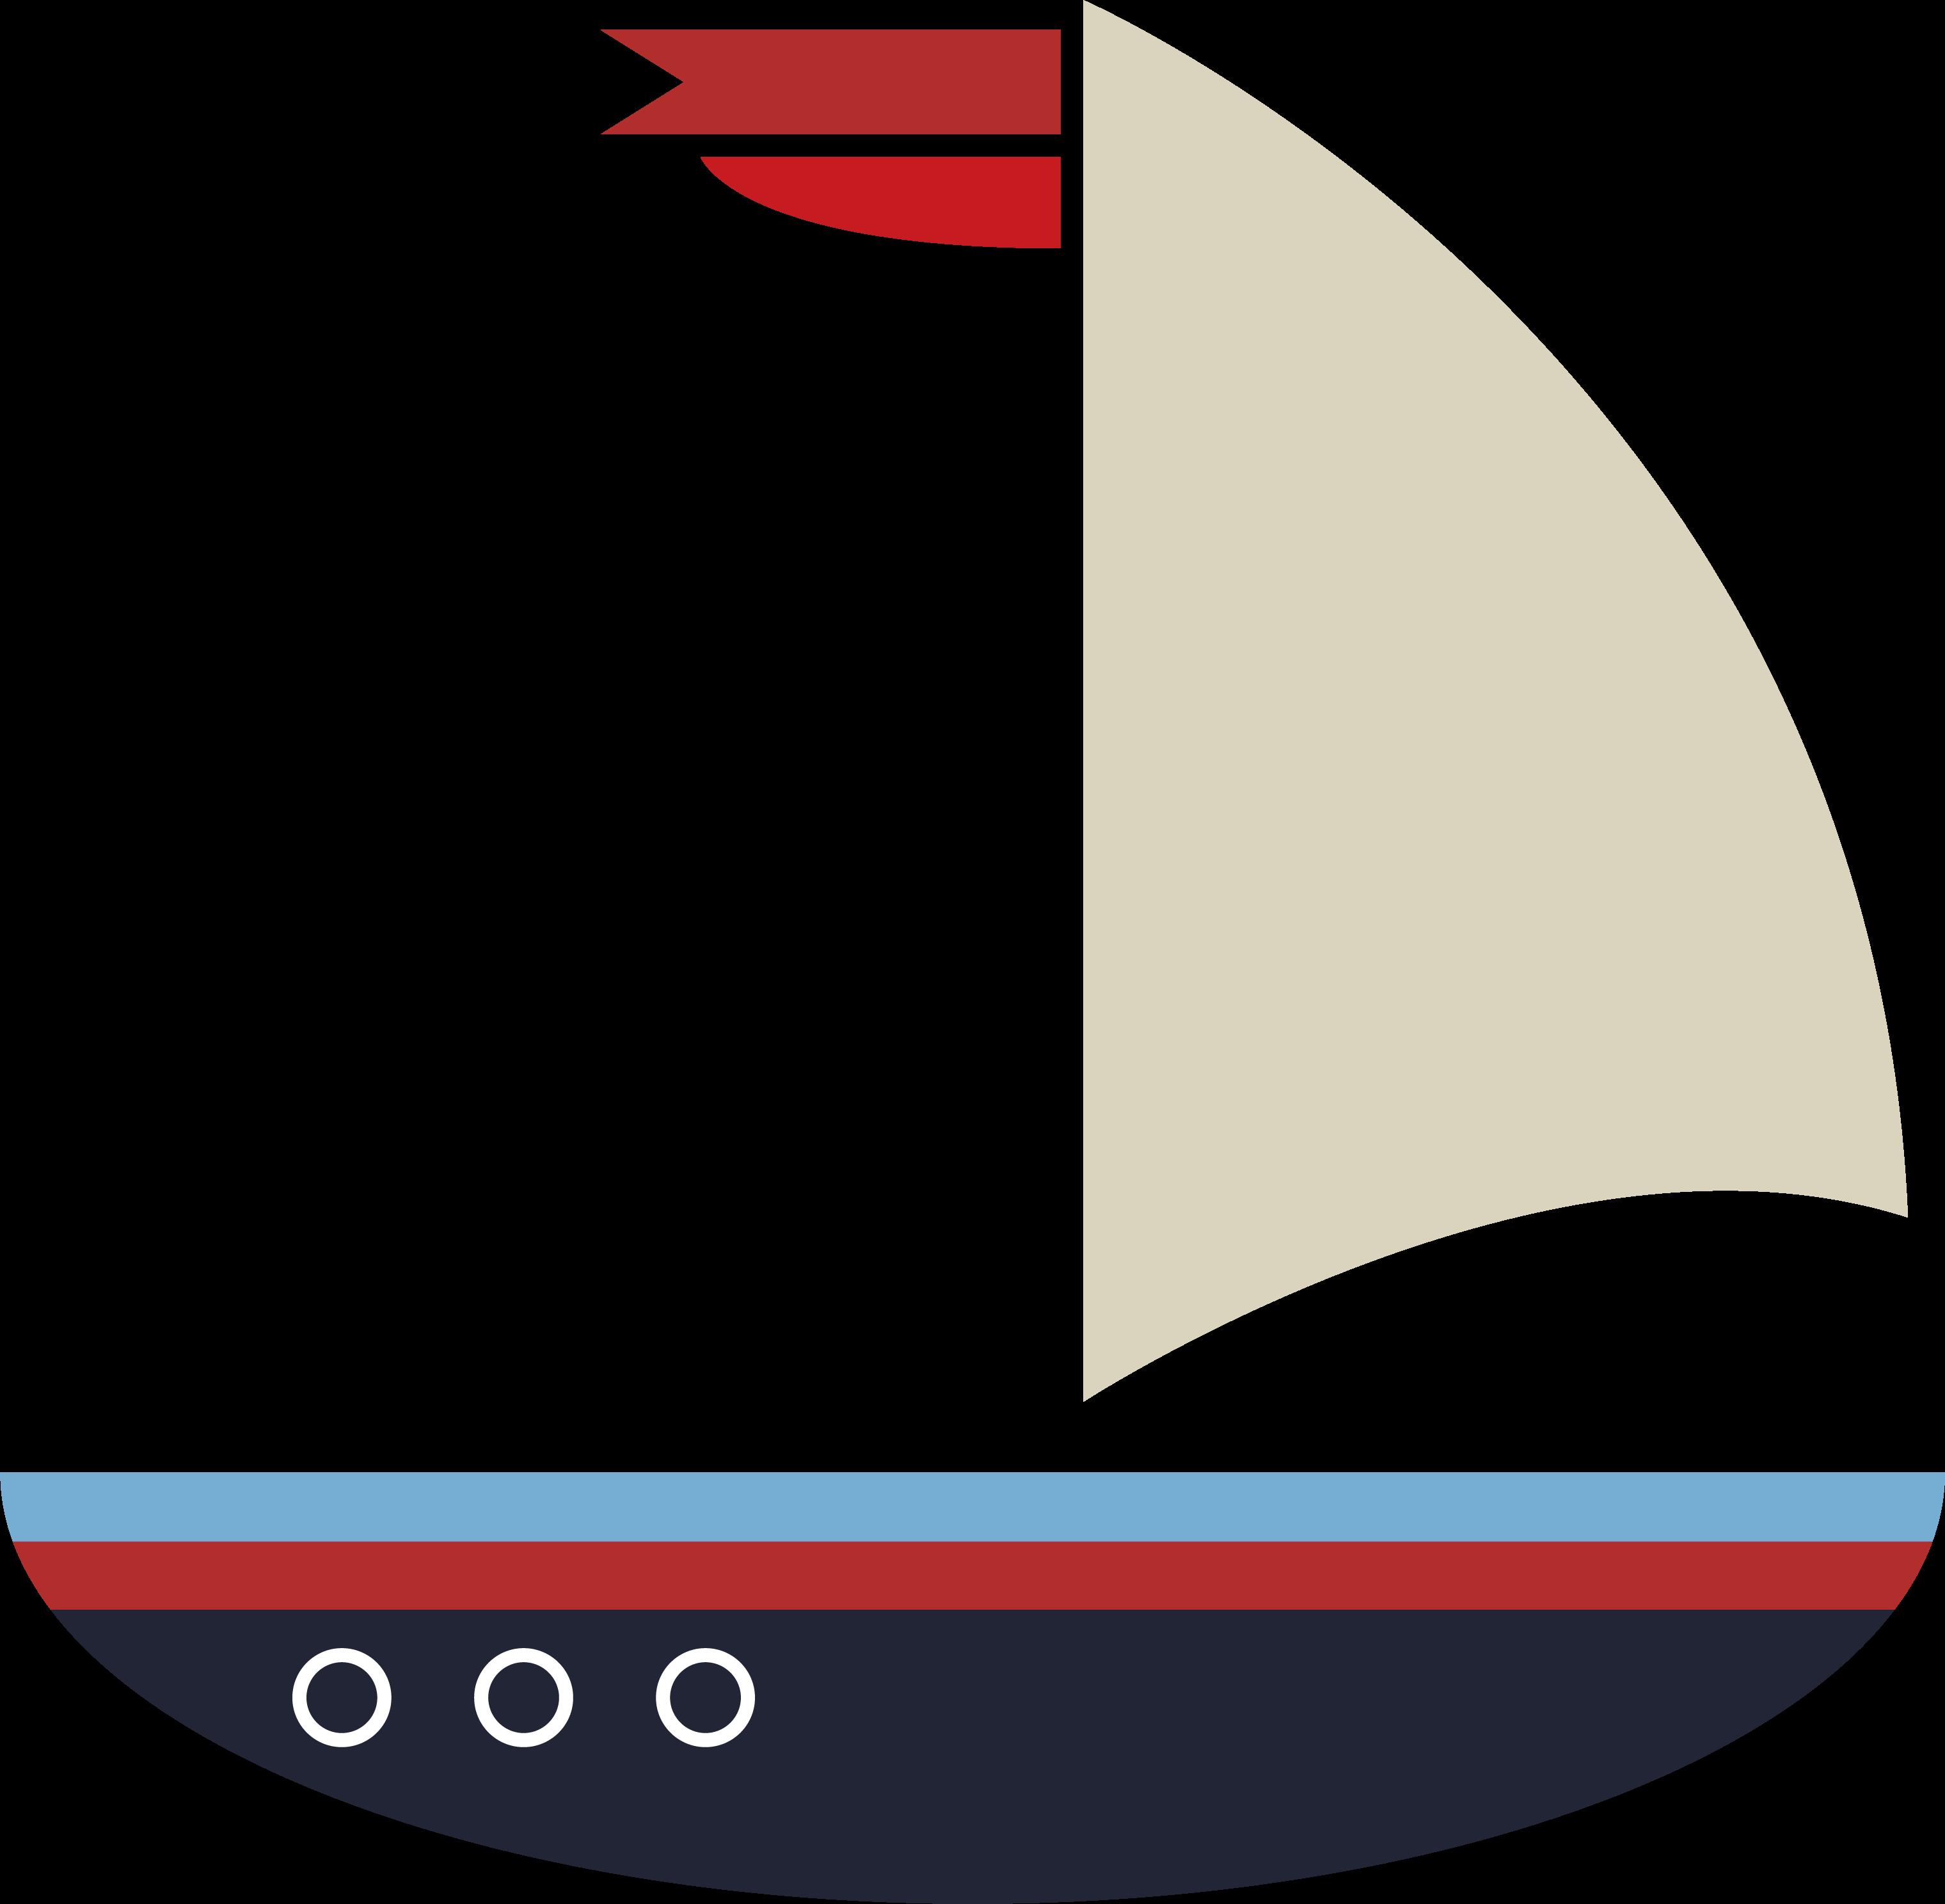 Deep Blue Sea Sailboat SVG Cut File